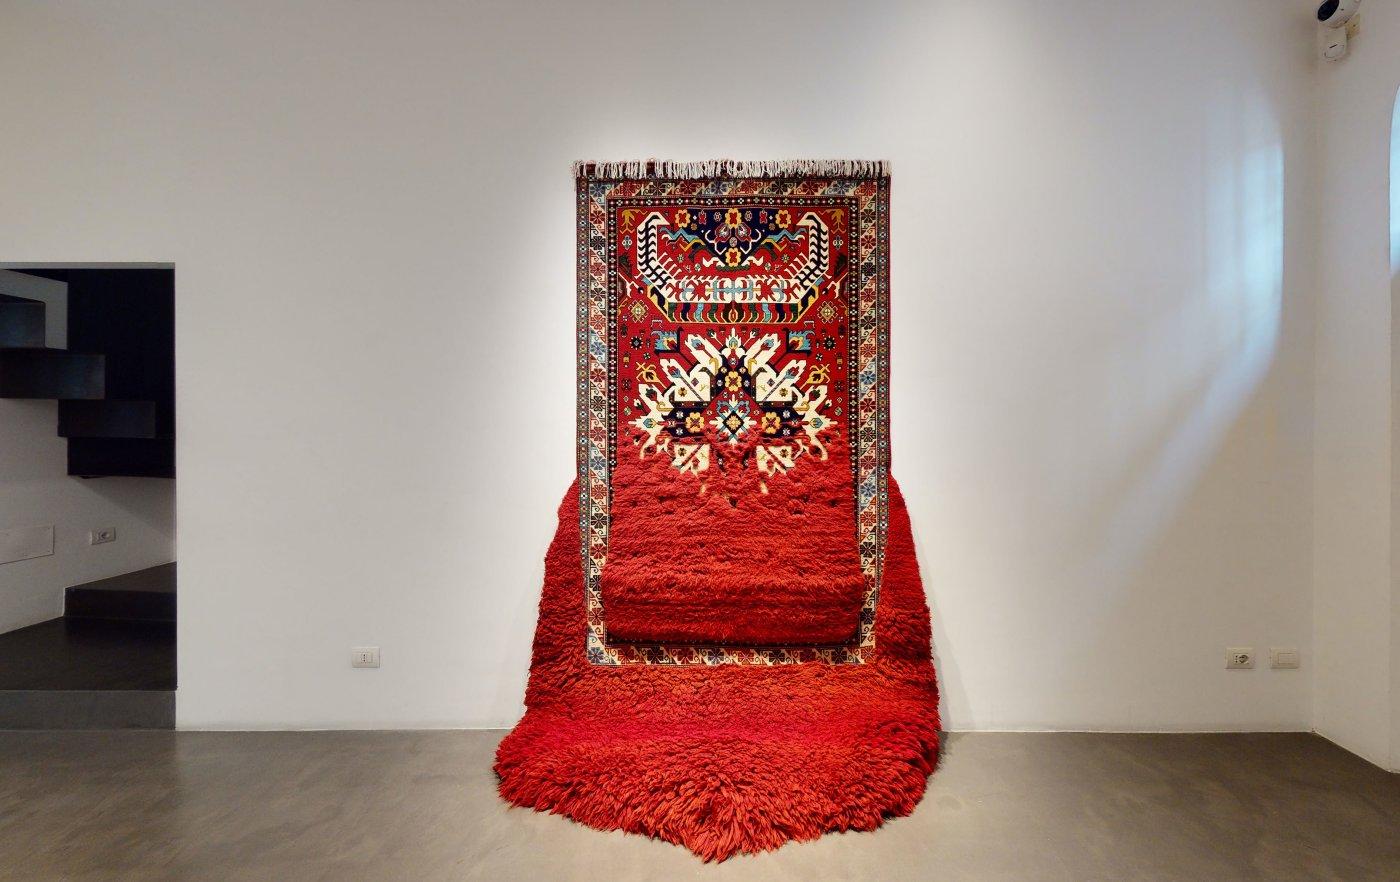 Galleria Anna Marra Viewing Room 1 2